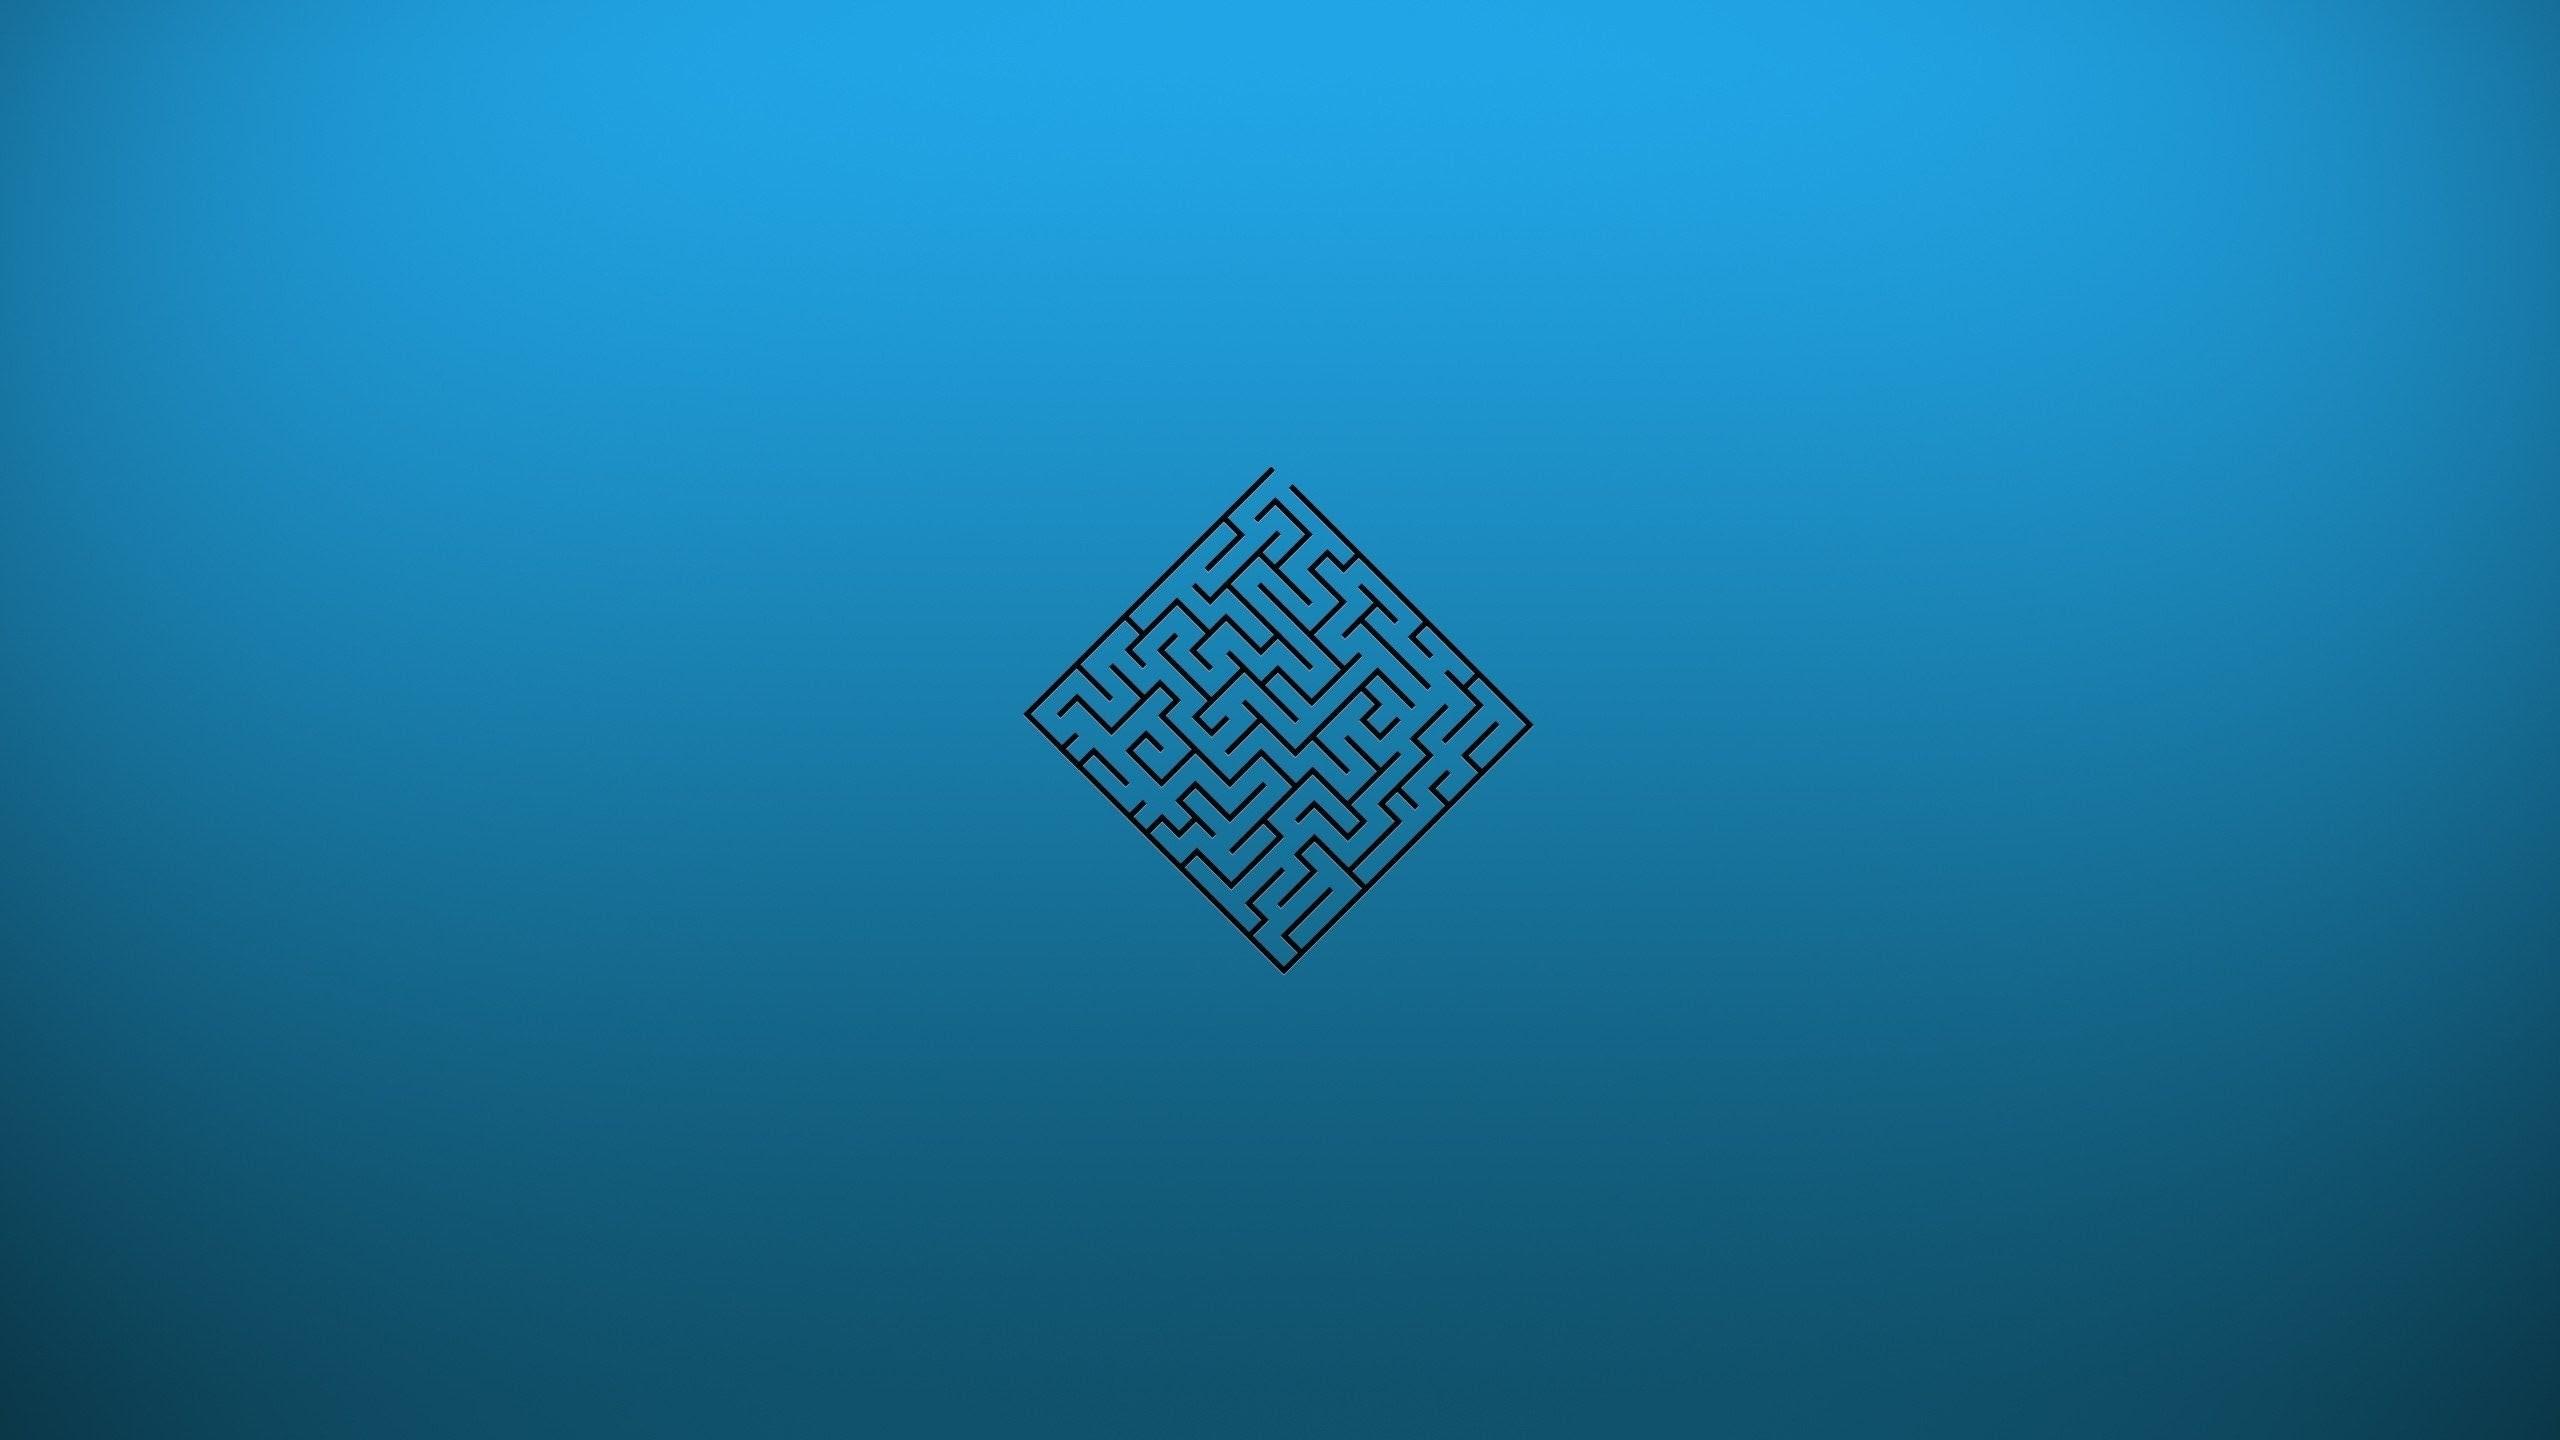 Res: 2560x1440, Loading Wallpaper